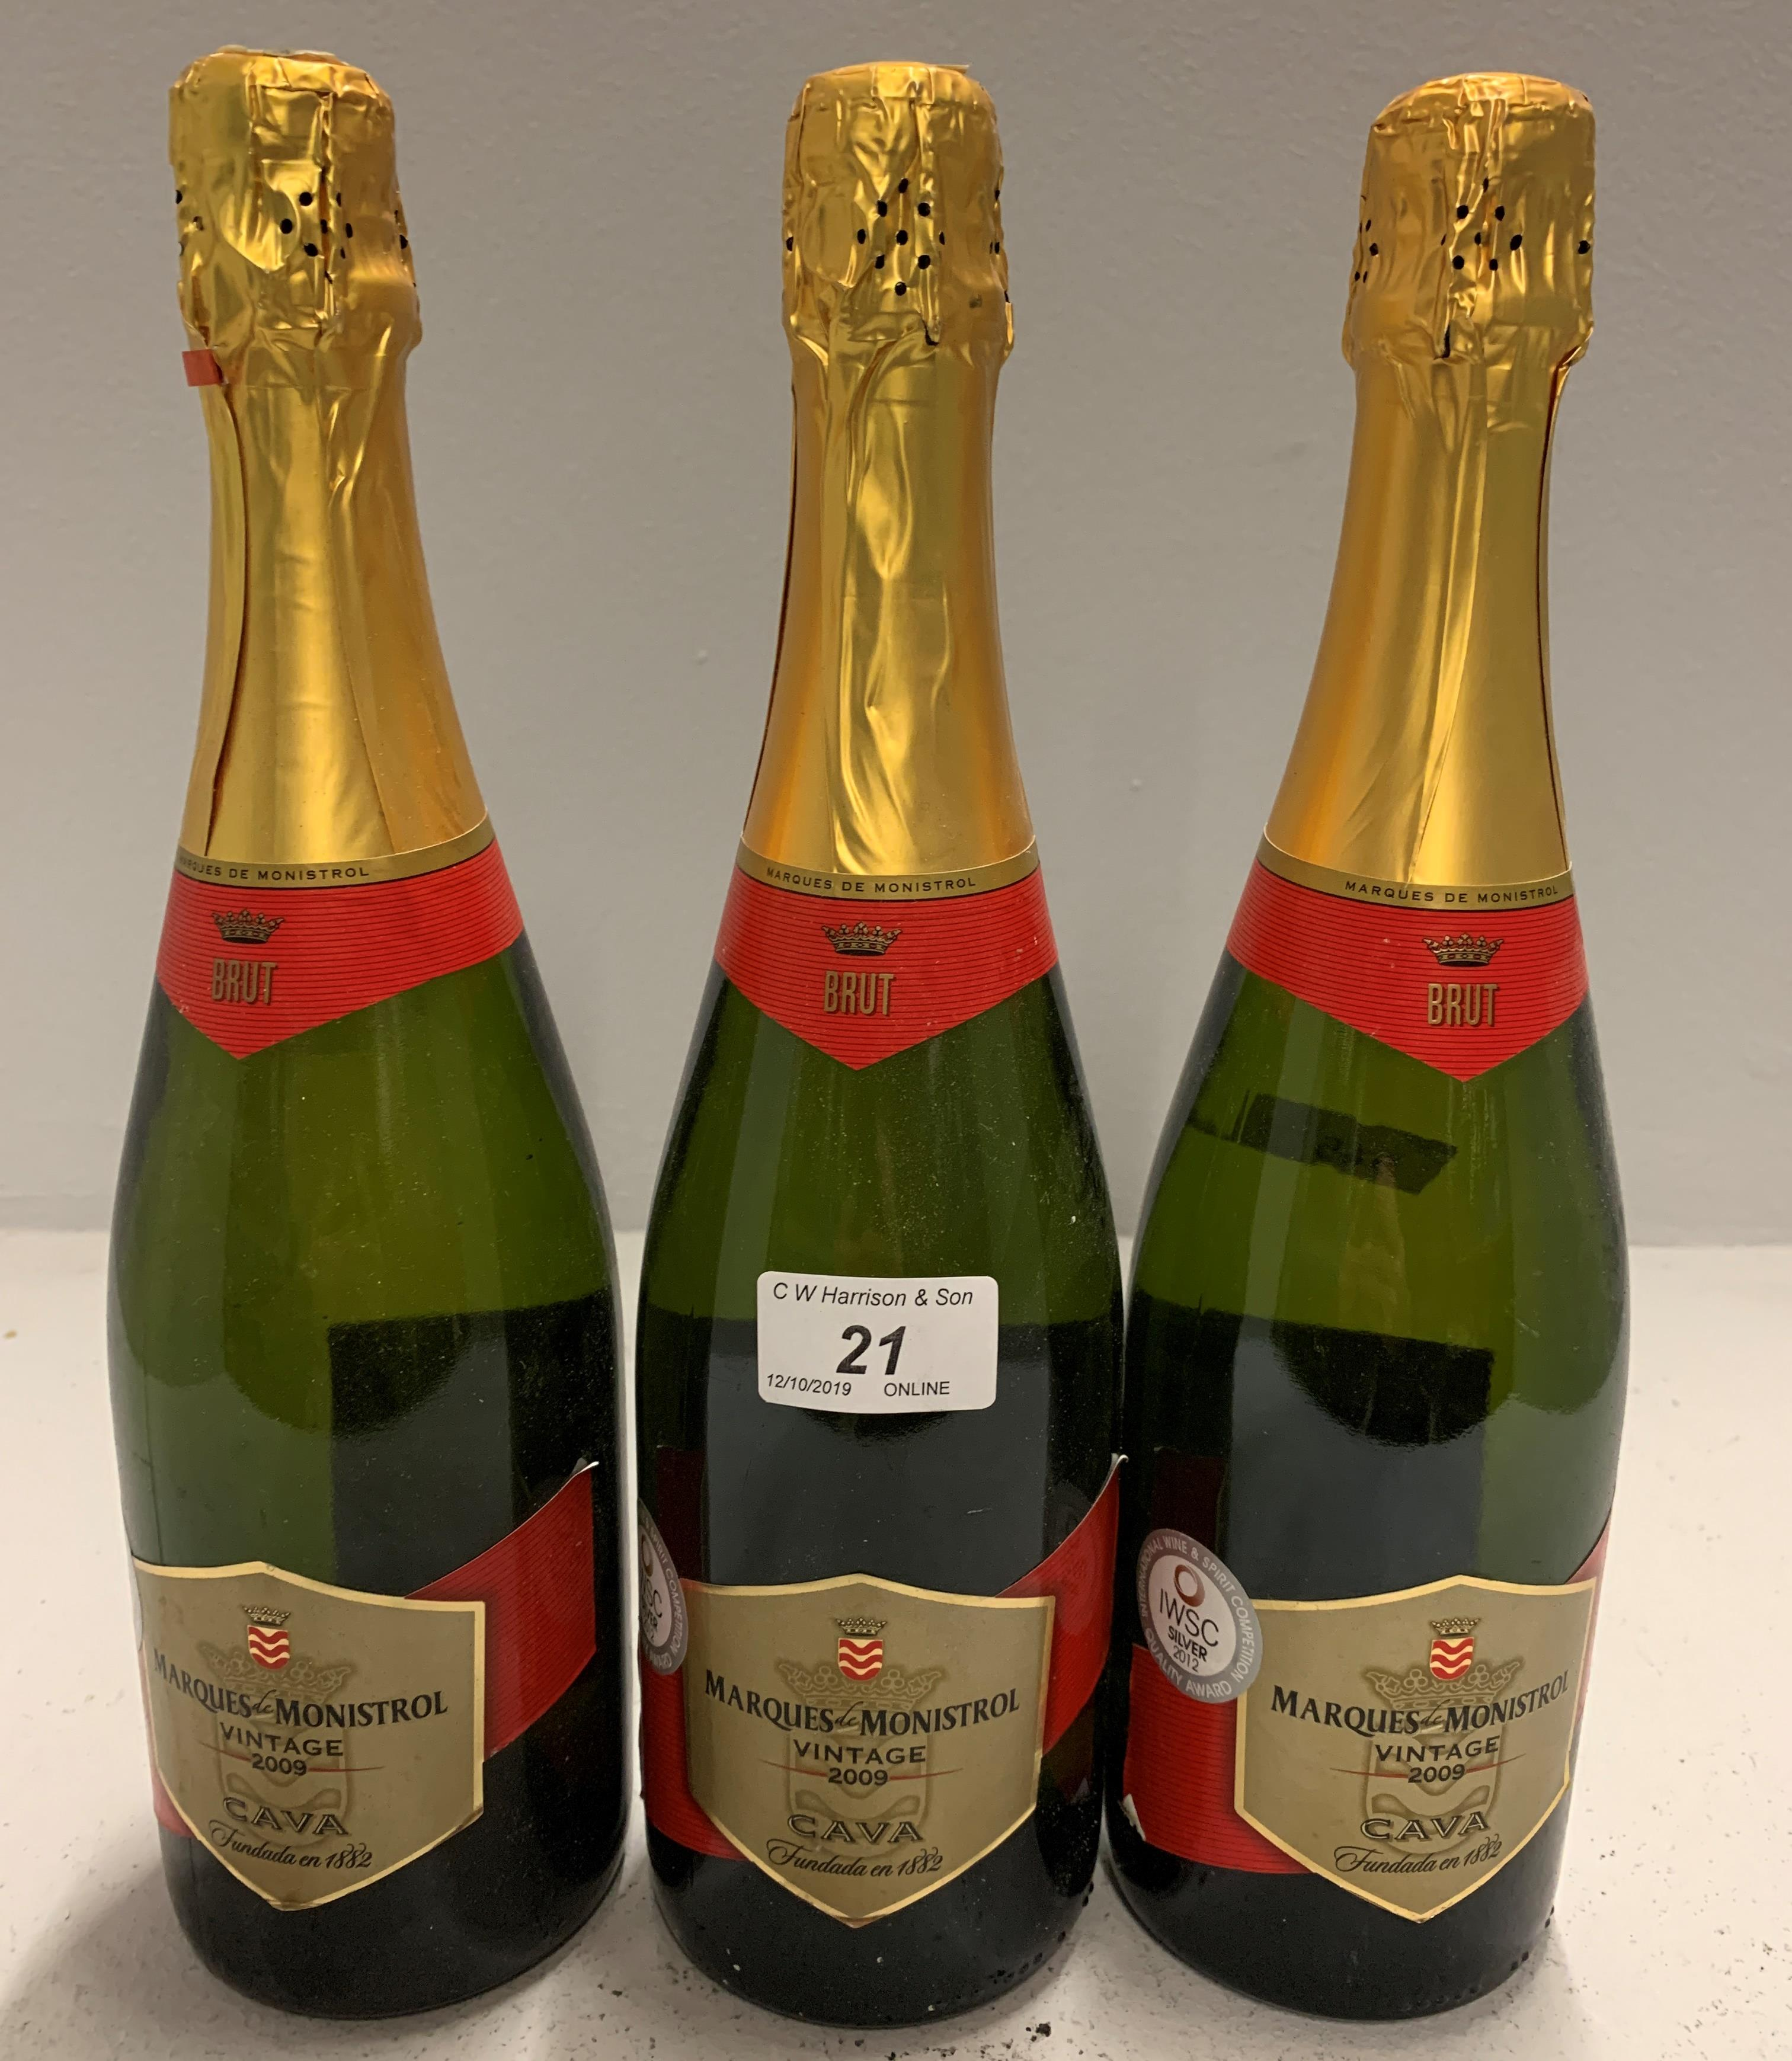 Lot 21 - 3 x bottles Marques-Monistrol Cava - Vin